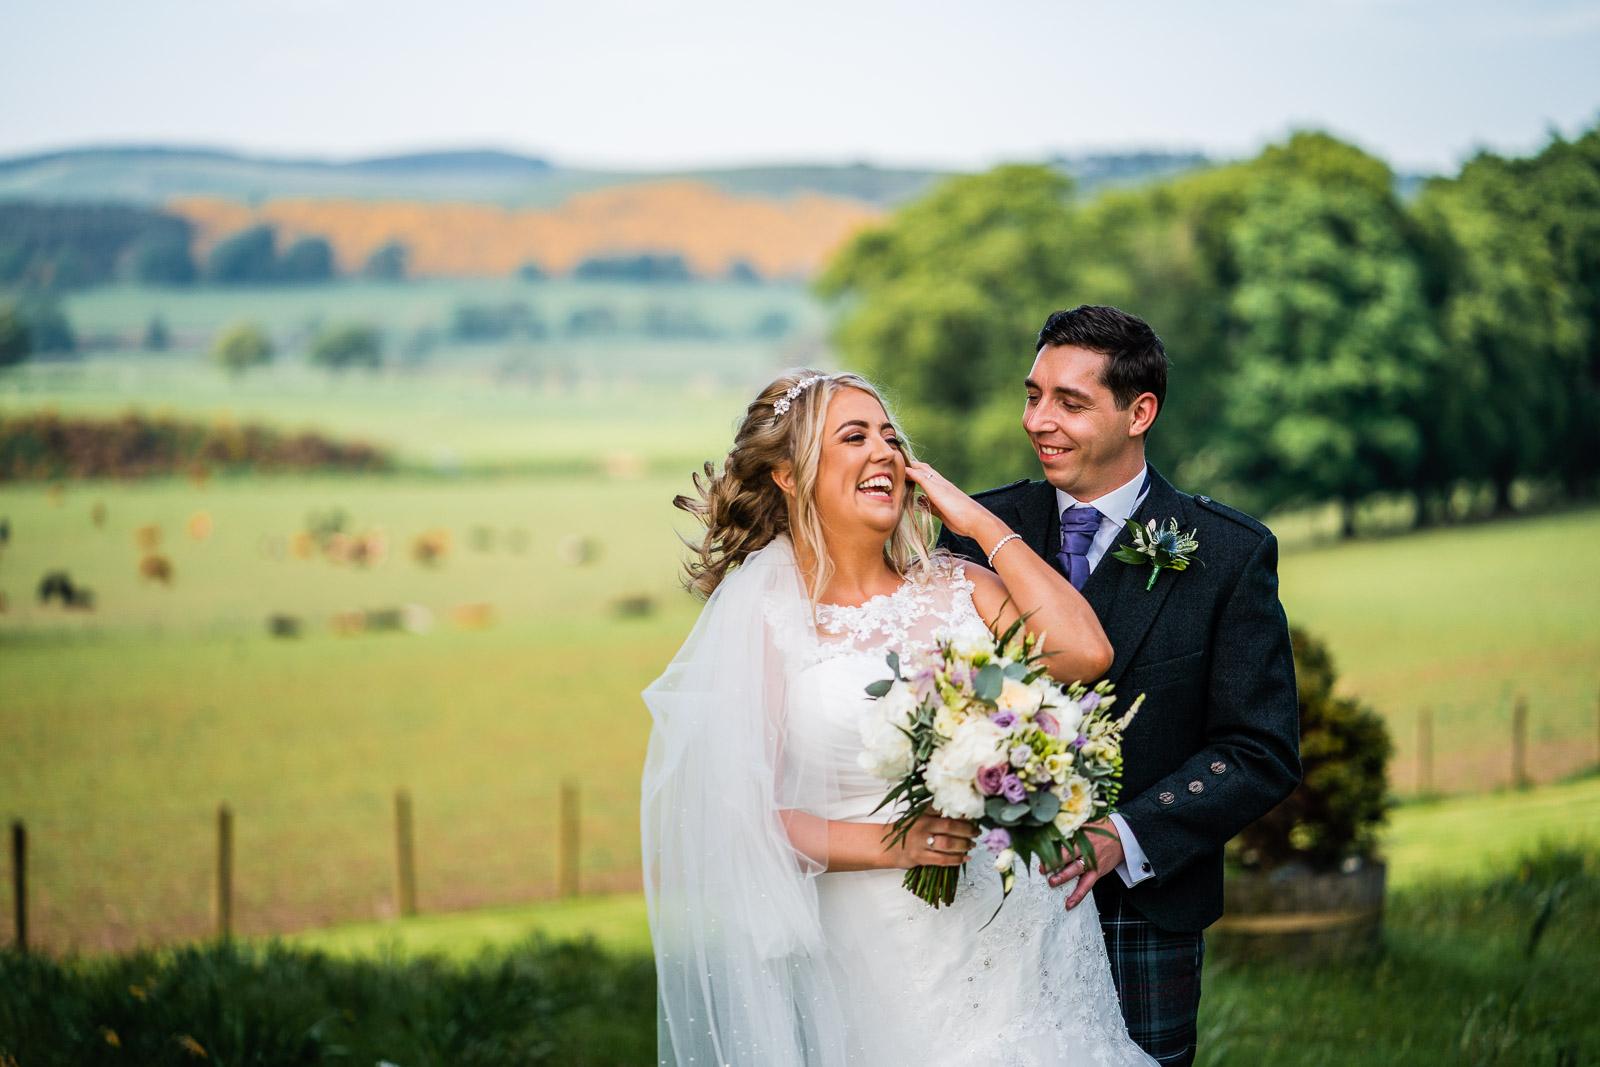 cornhill_castle_wedding_biggar_dearlyphotography (224 of 448).jpg